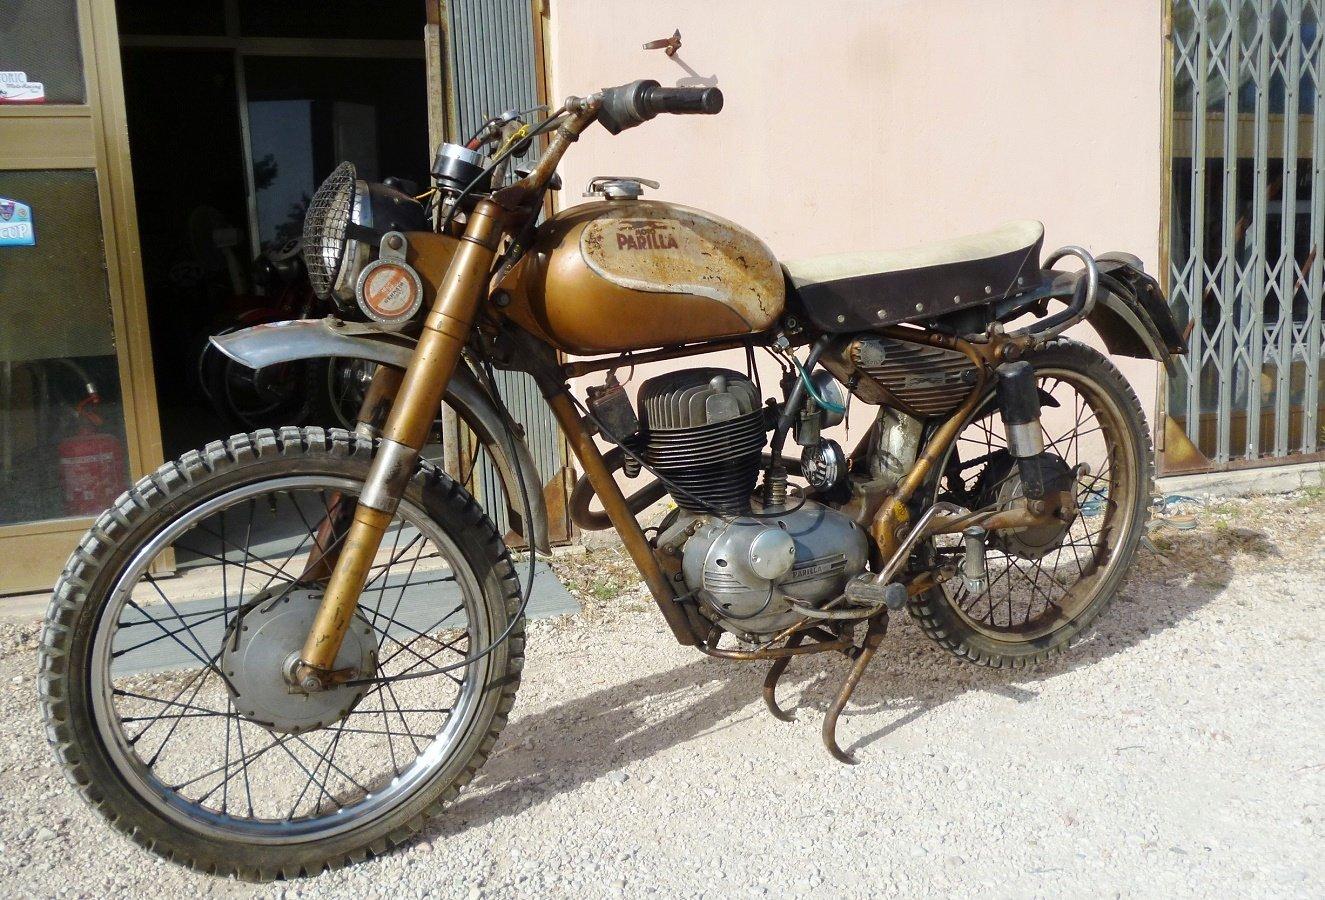 1958 Parilla 125 Wildcat For Sale (picture 1 of 6)